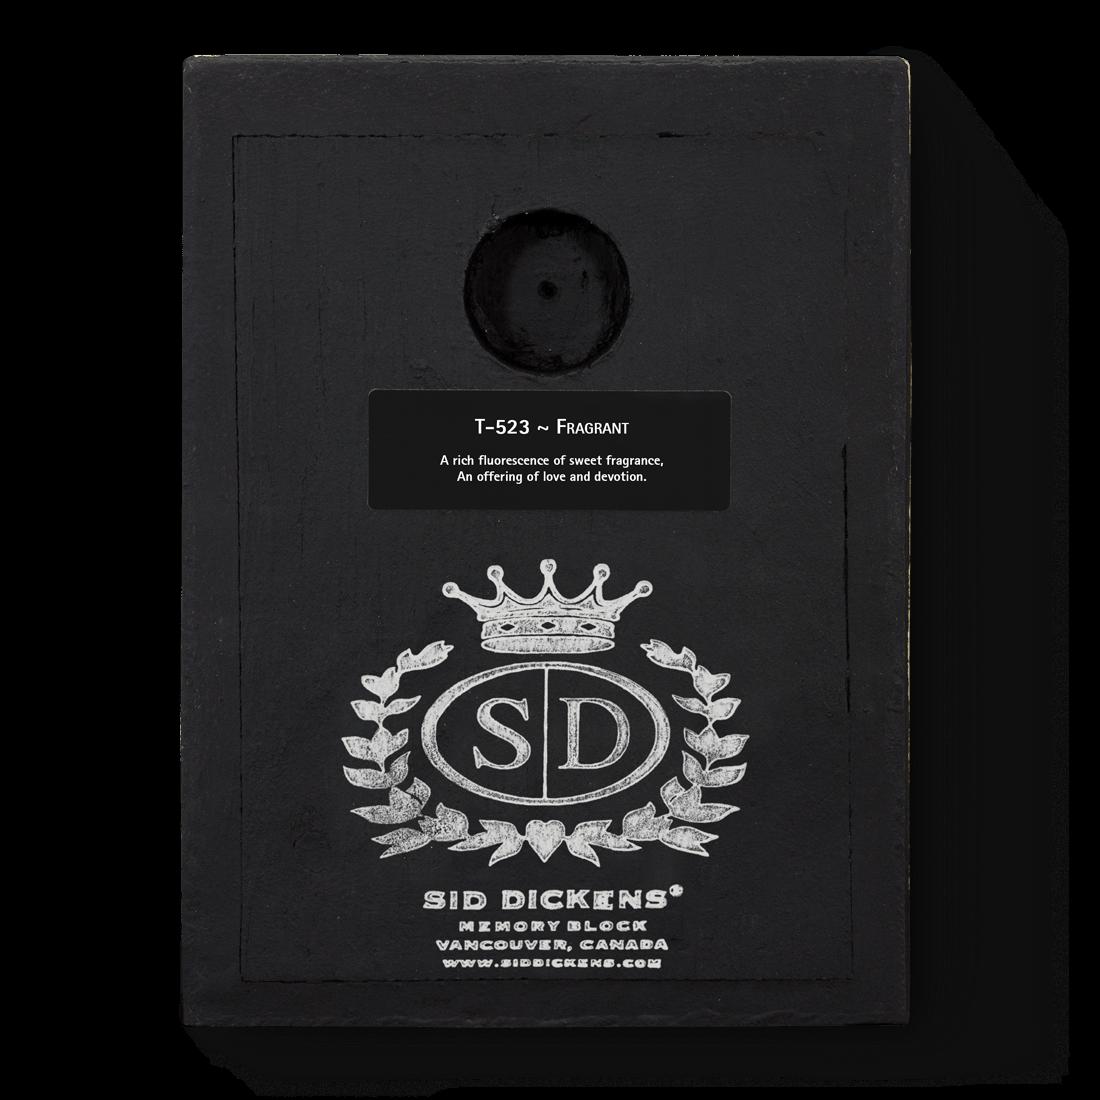 T523 - Fragrant - Memory Block Sid Dickens